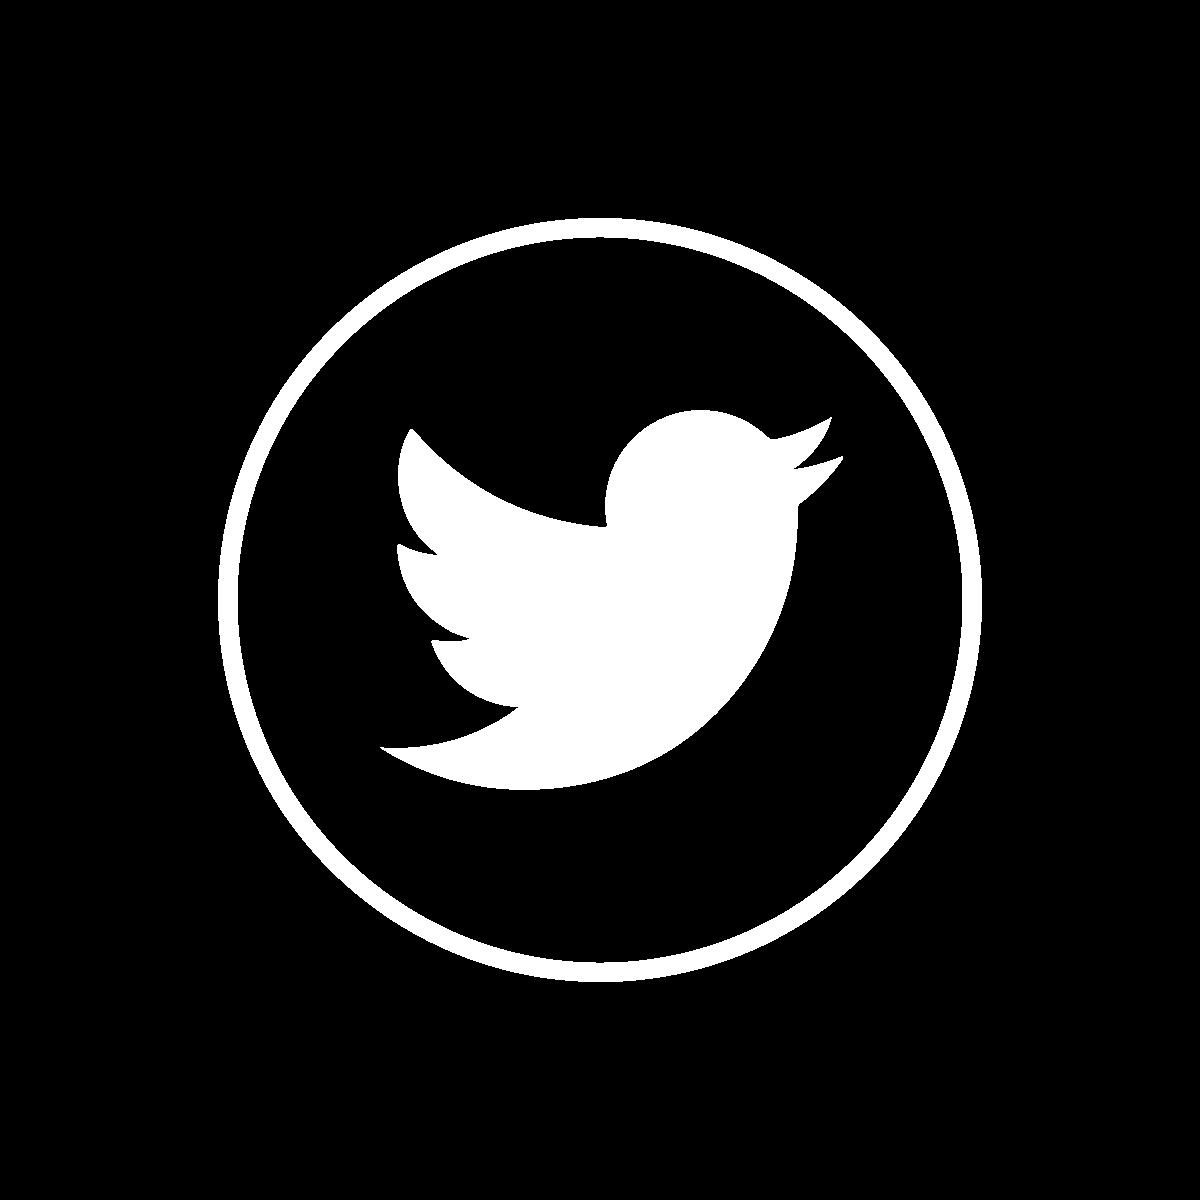 np_social-media-icon_2255036_FFFFFF.png